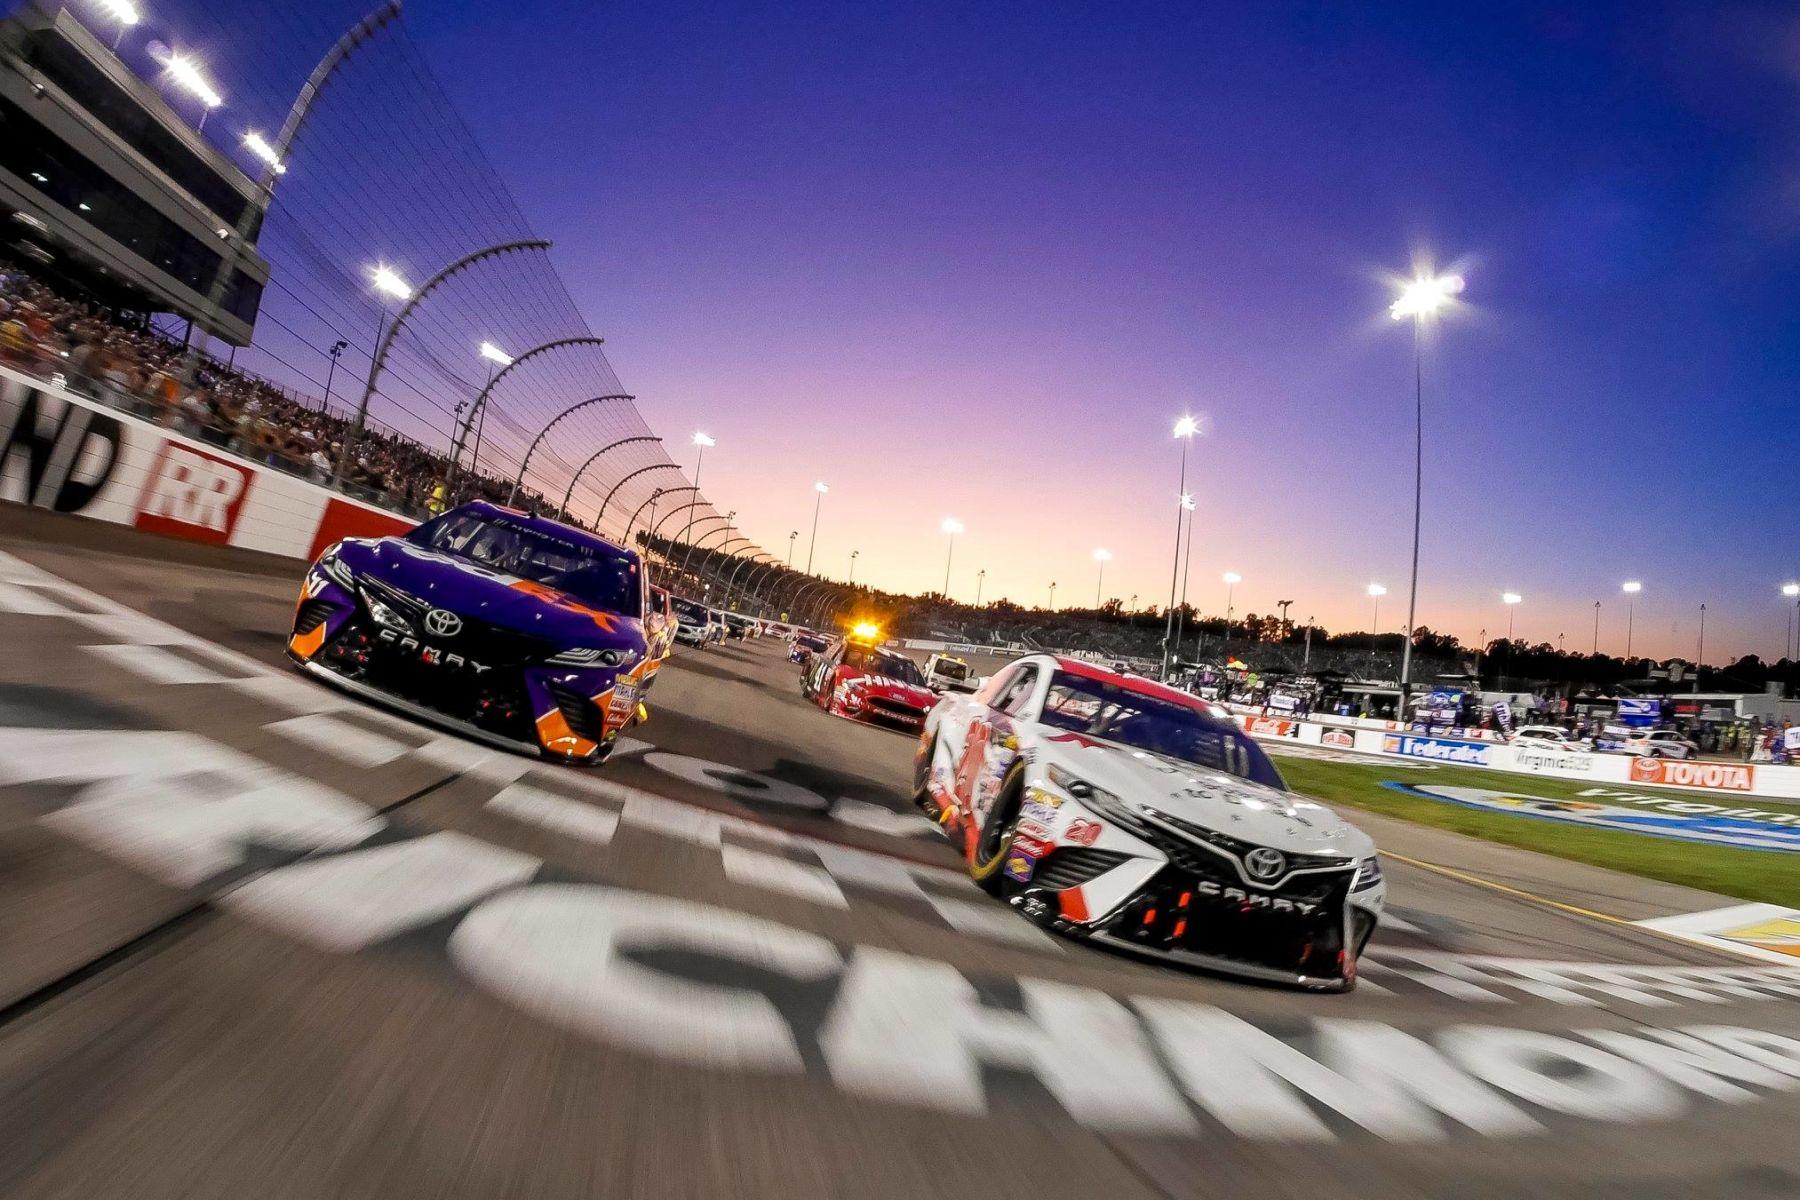 Richmond Raceway Tv Schedule September 2018 Racing News Nascar Nascar Race Cars Racing News